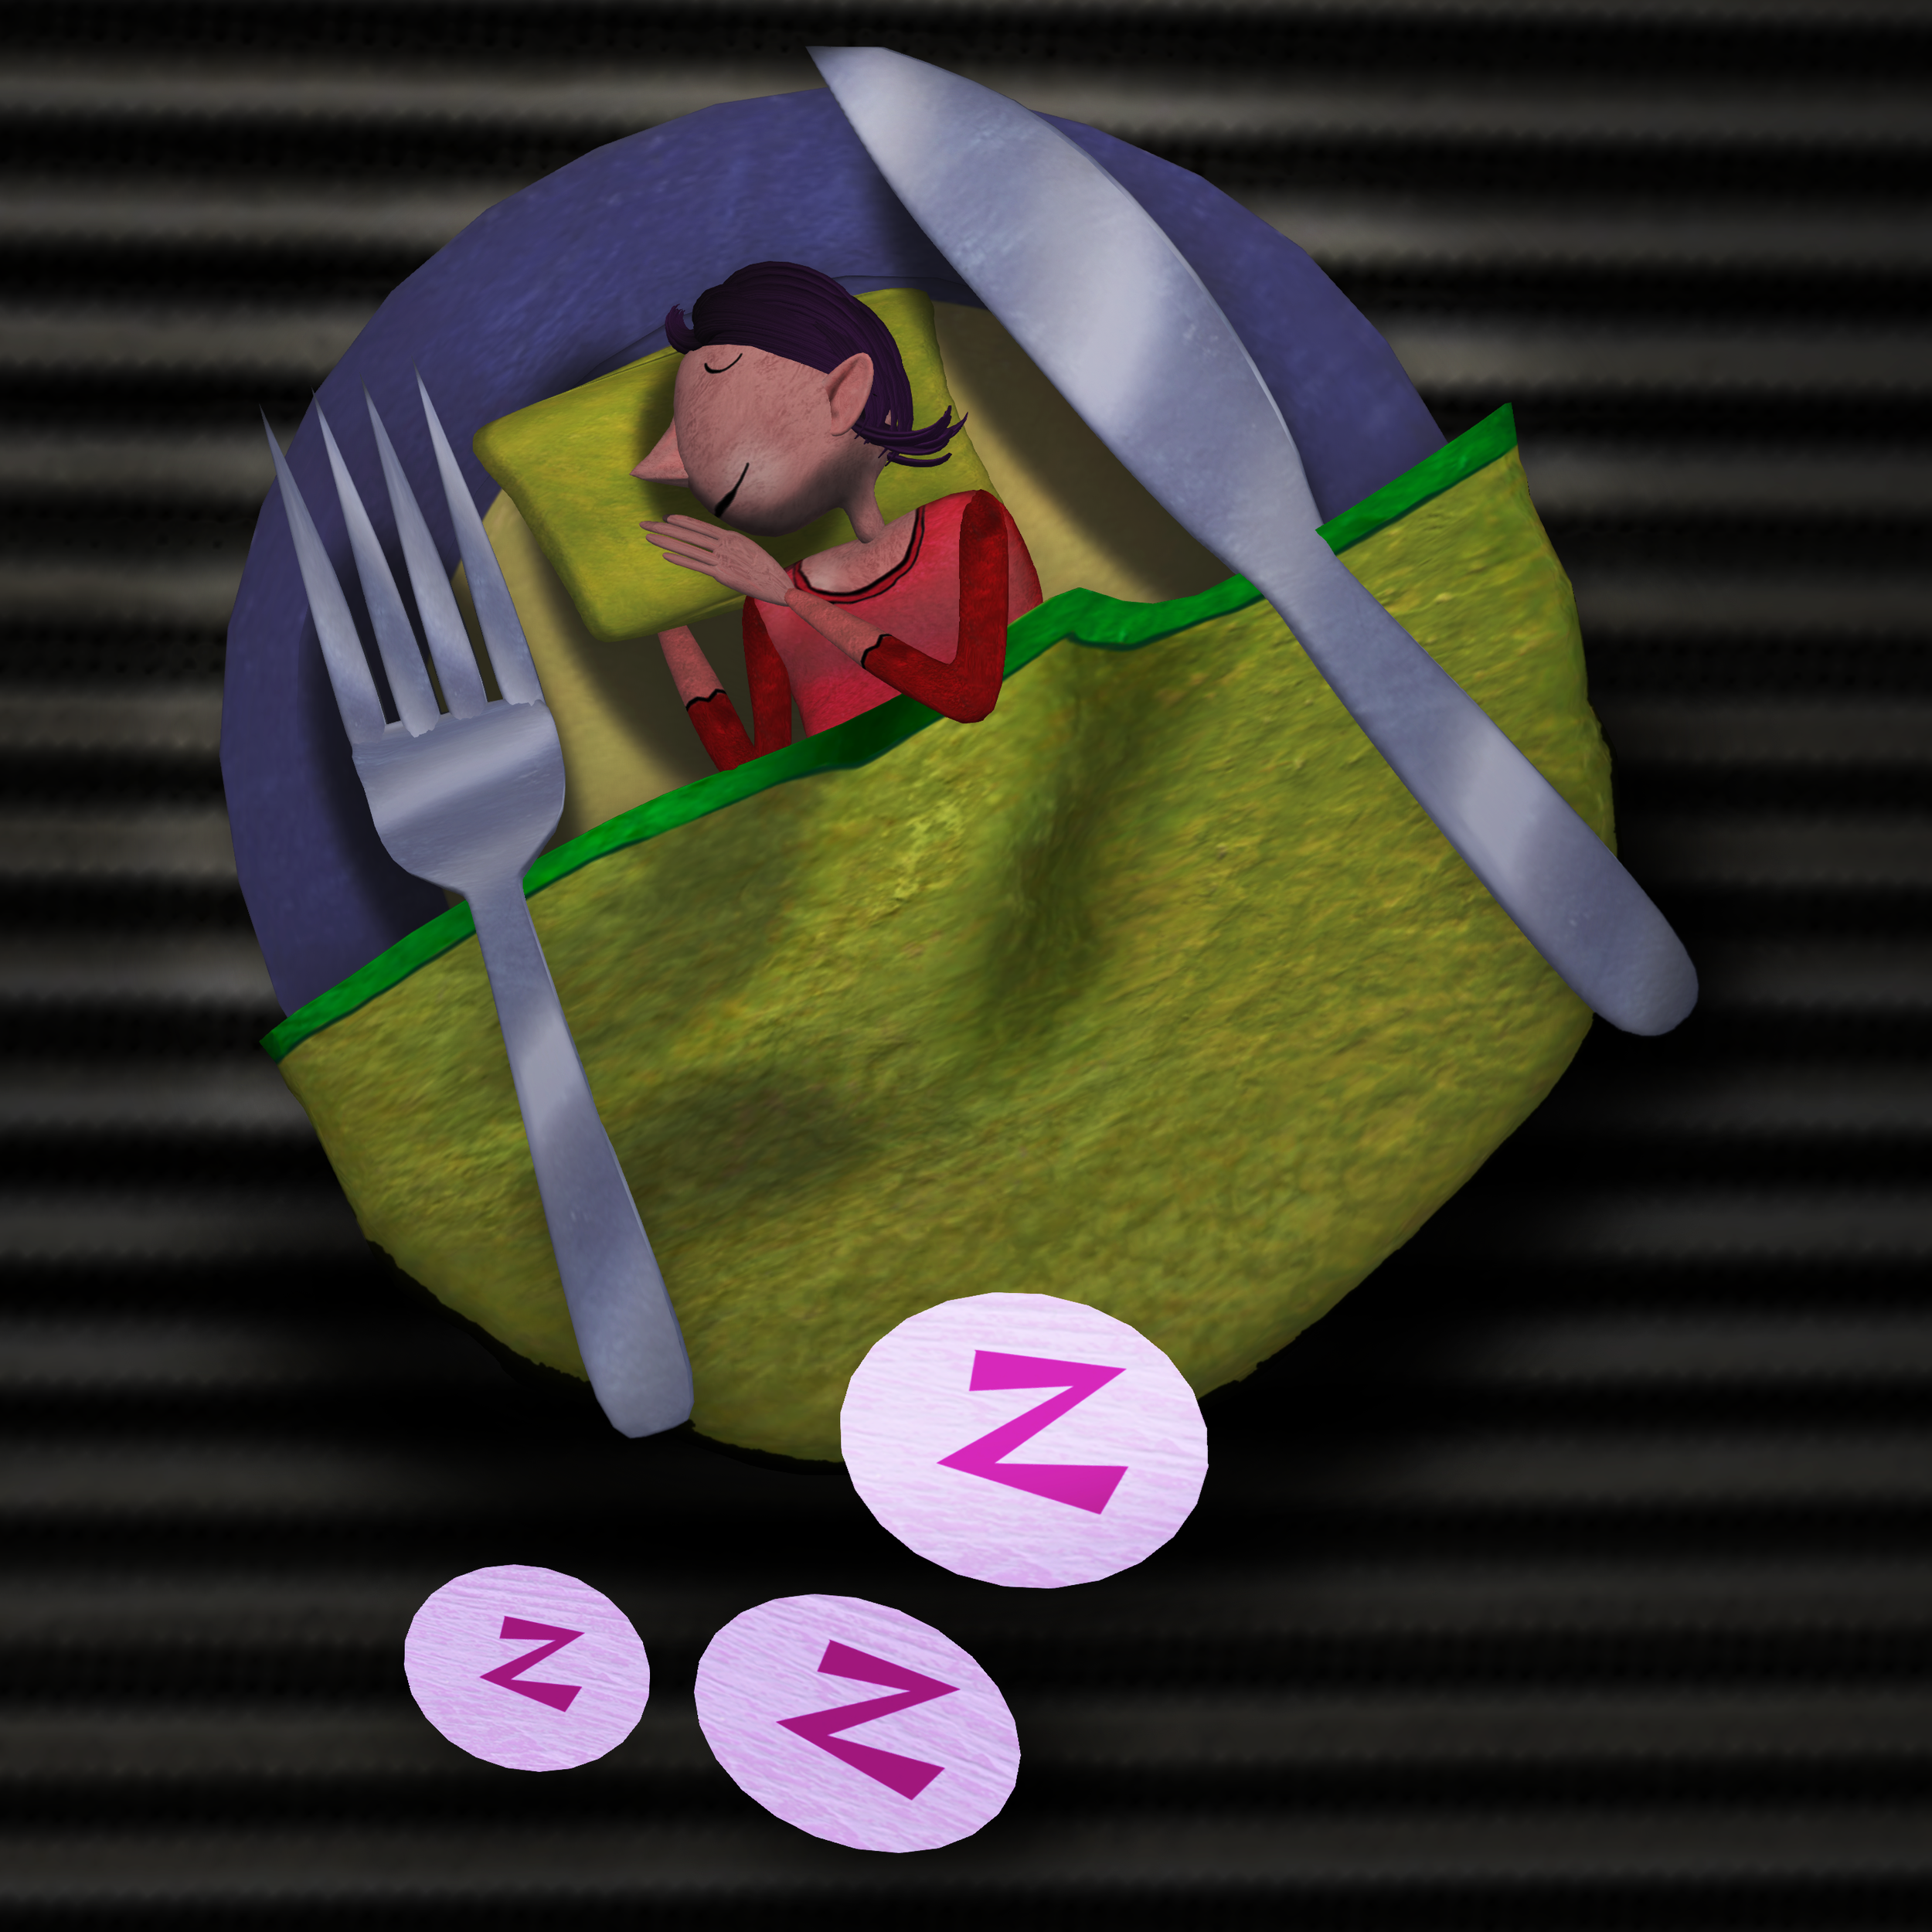 Dreaming in 3D